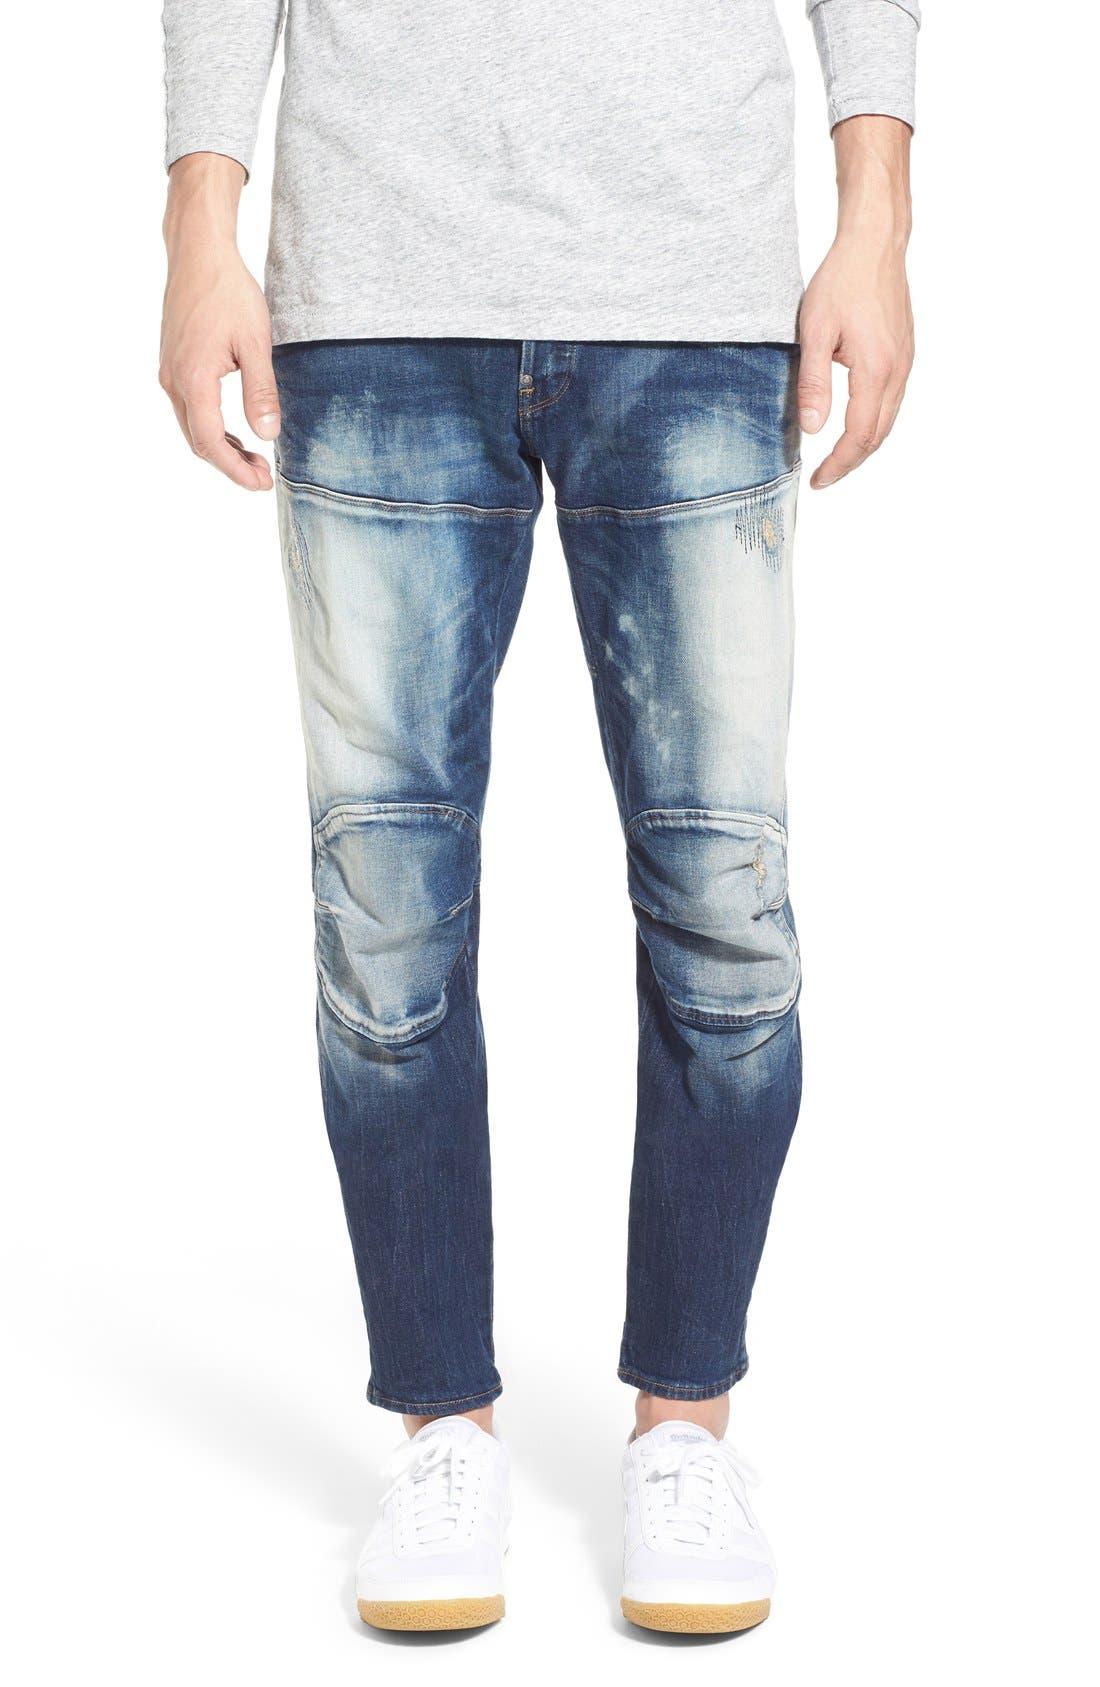 Main Image - G-Star Raw '5620 Type C' Skinny Fit Moto Jeans (Moon Wash Restored)